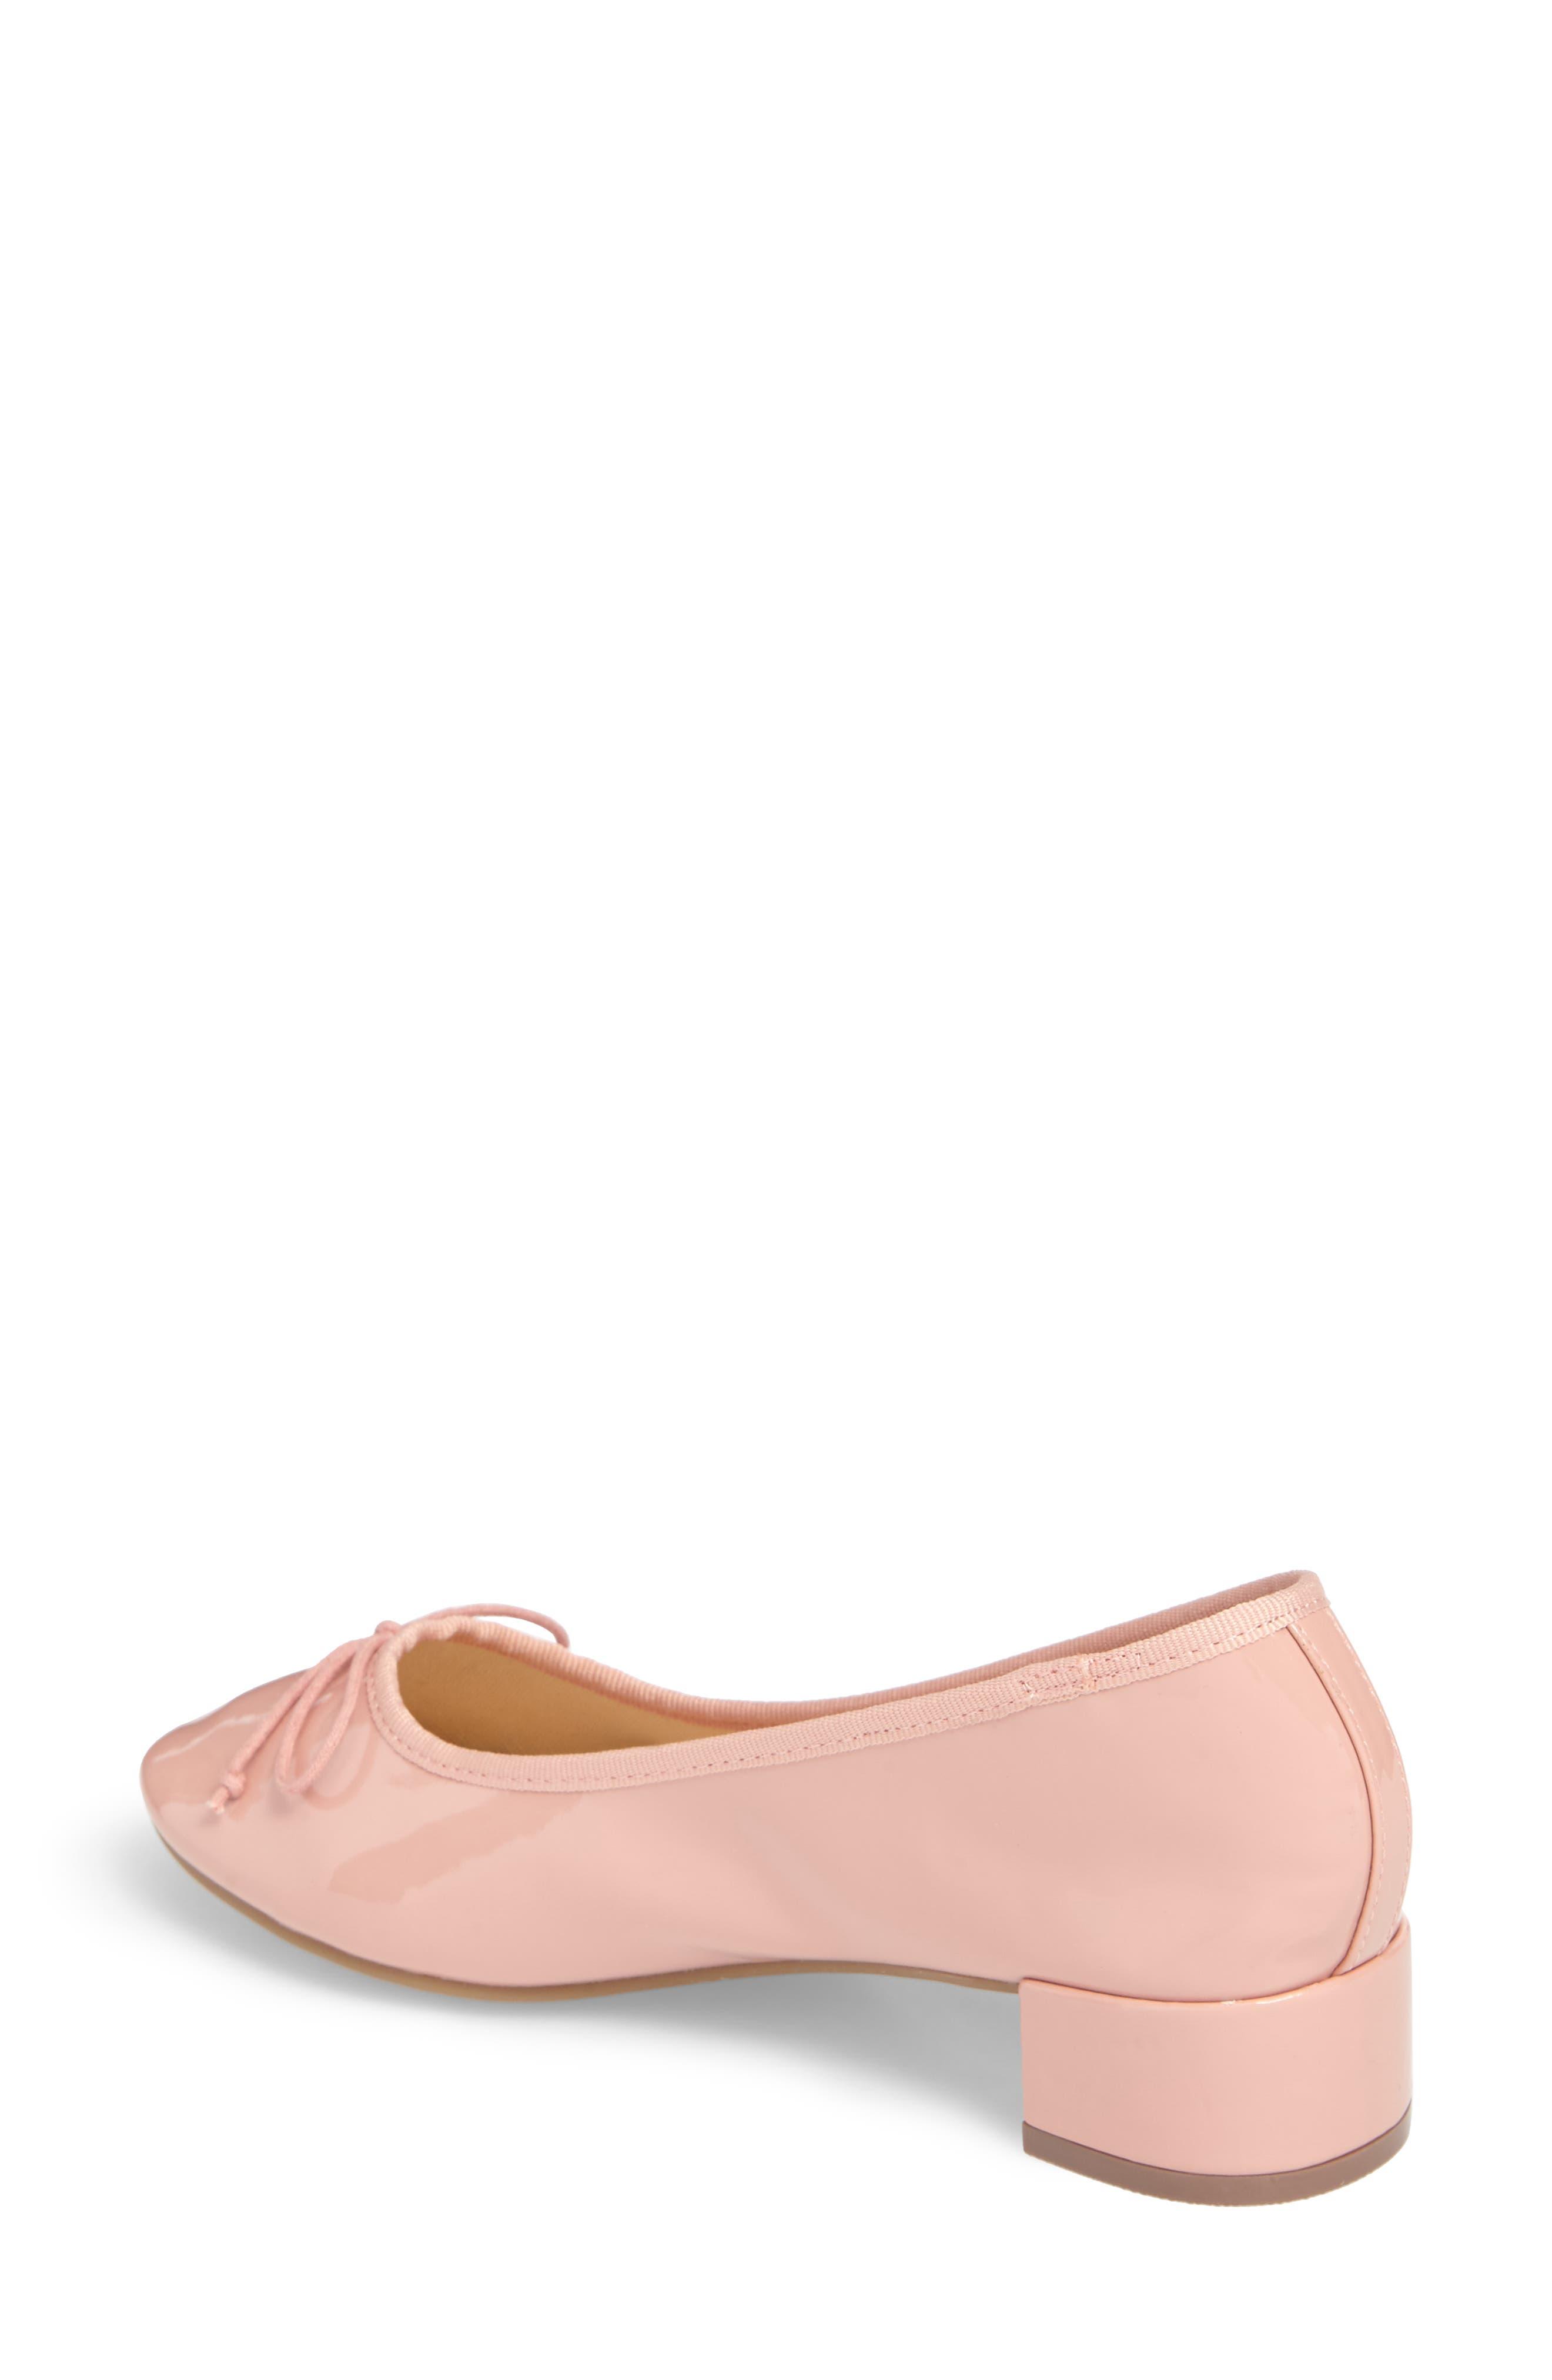 Glory Heeled Ballerina Slippers,                             Alternate thumbnail 3, color,                             650